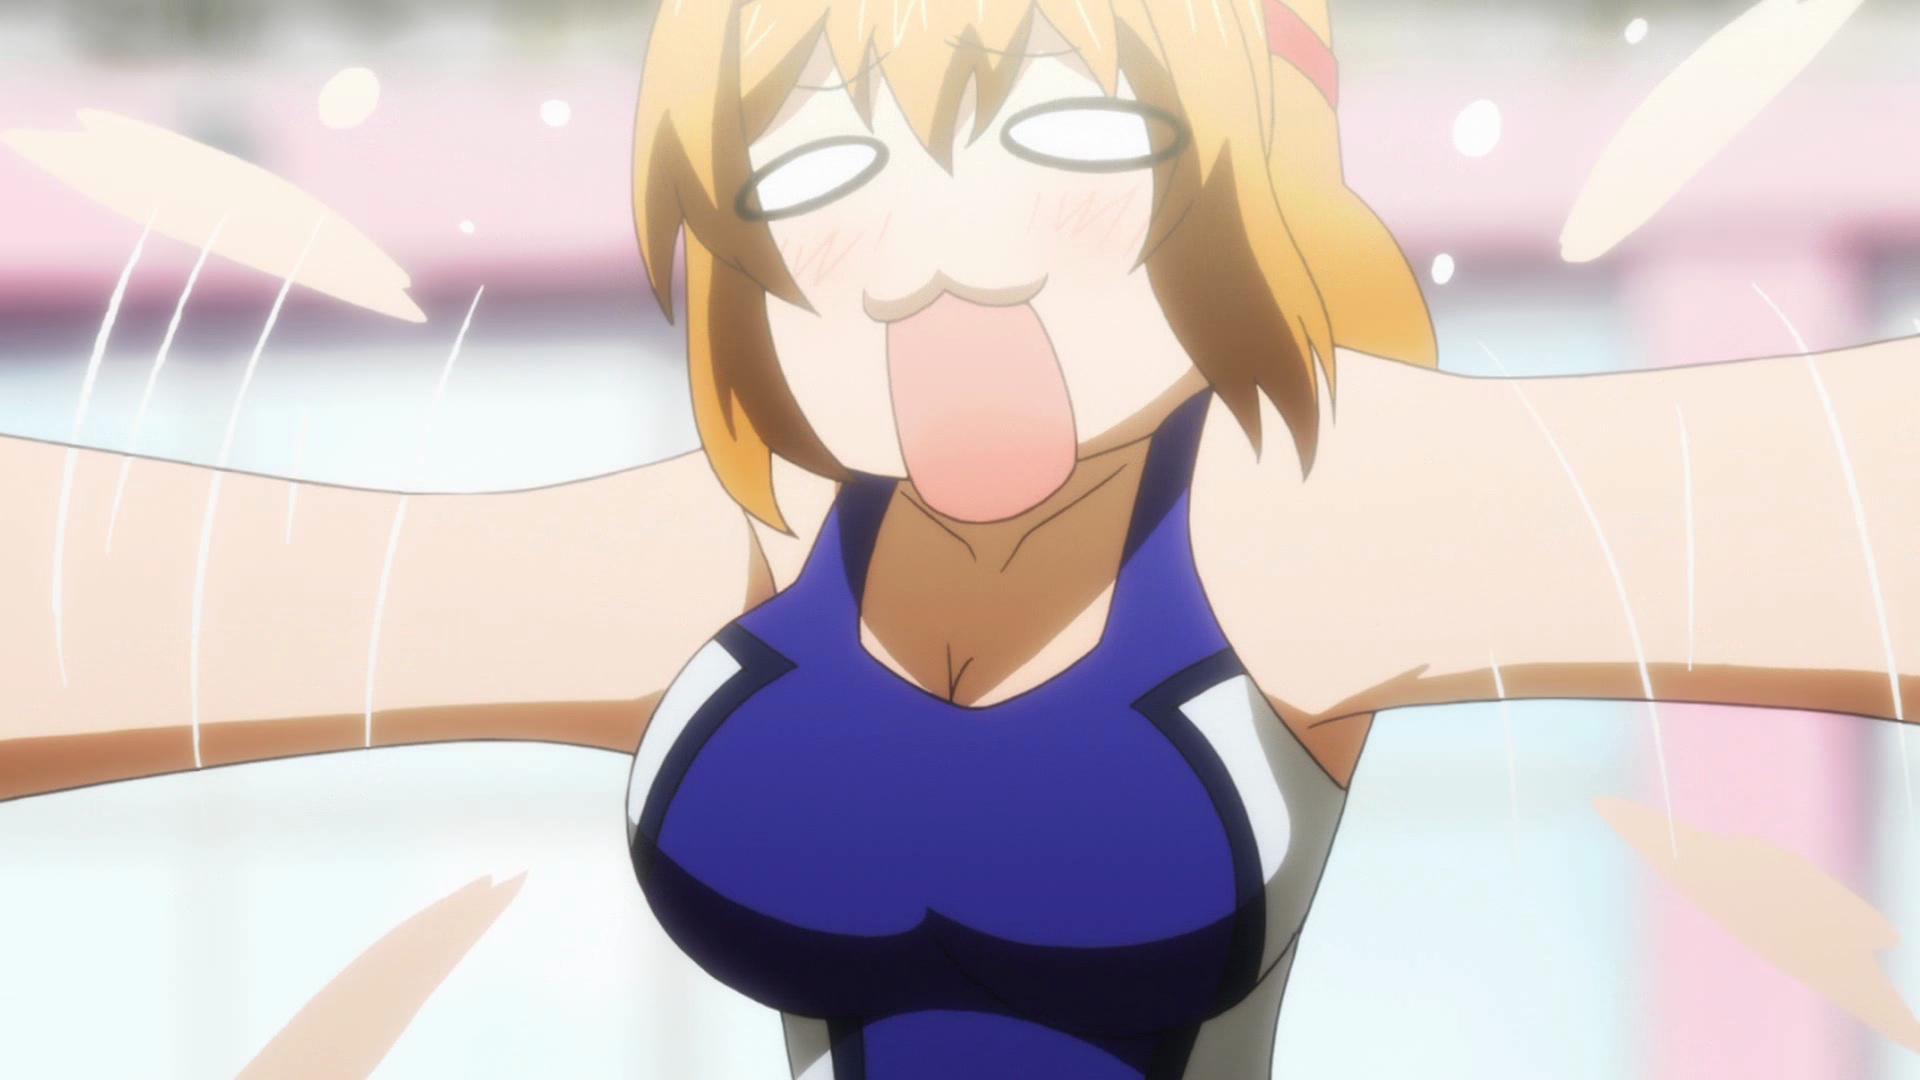 Hot latin girl naked